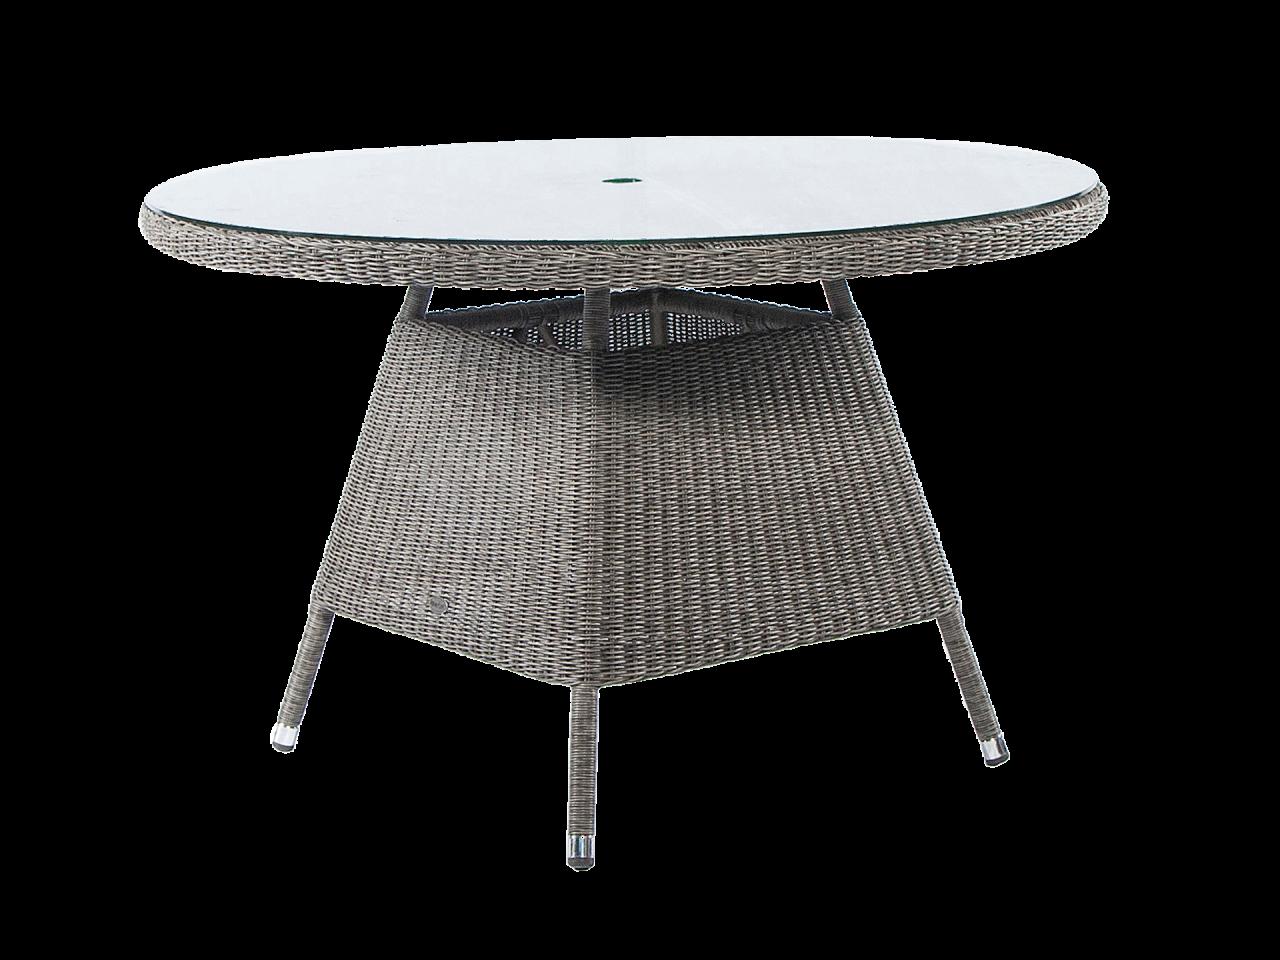 Стол круглый со стеклом Monte Carlo 1.2 м.